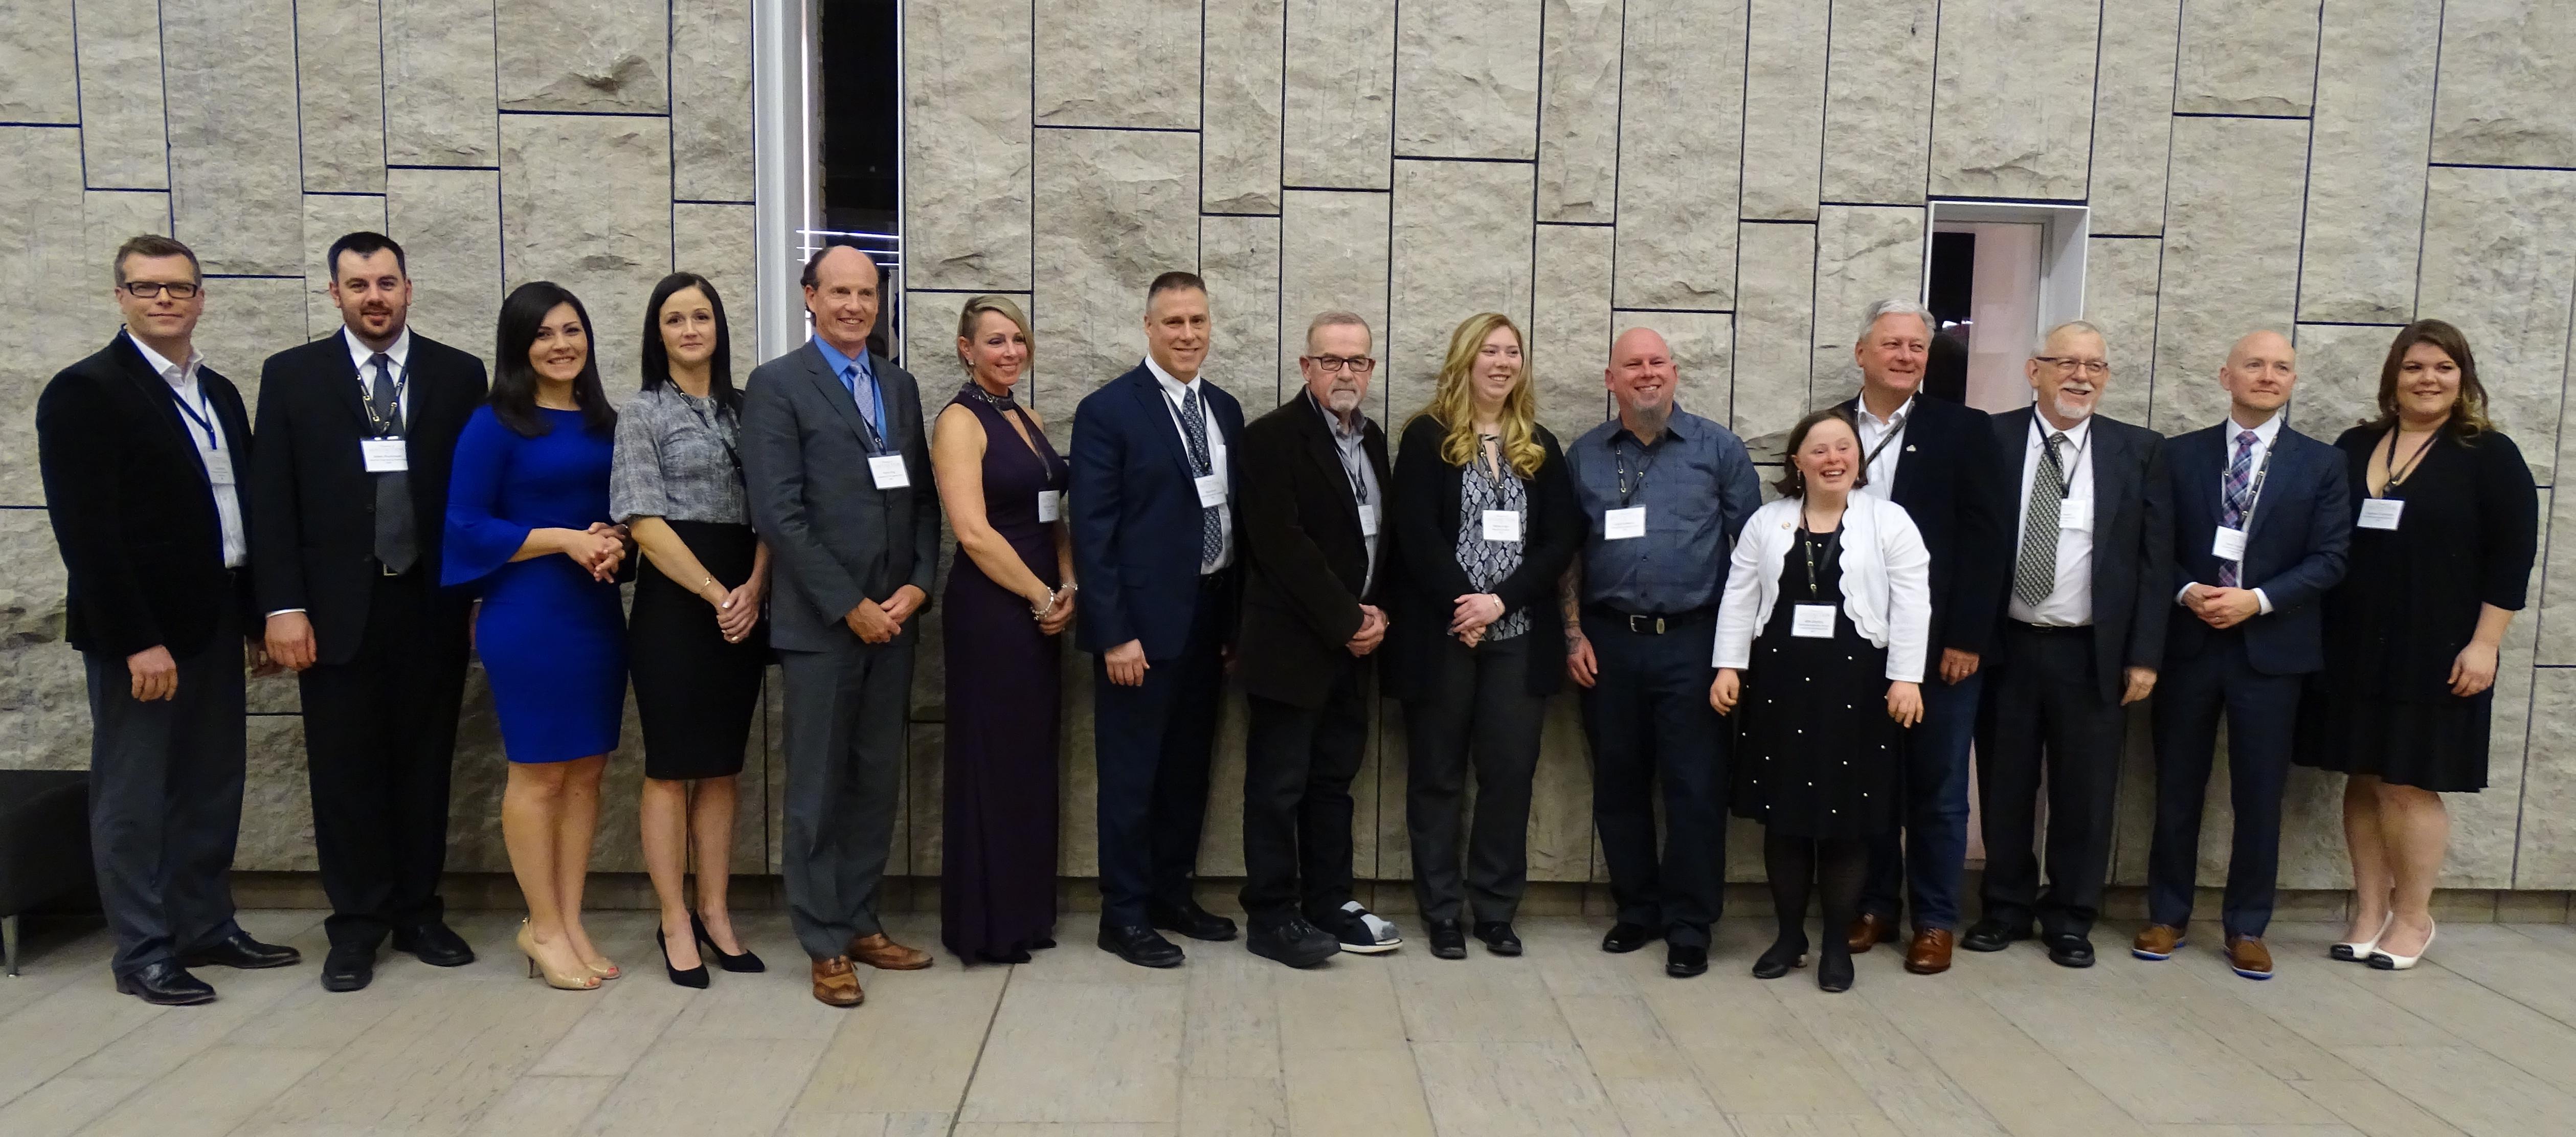 Conestoga College - Alumni of Distinction 2017.JPG